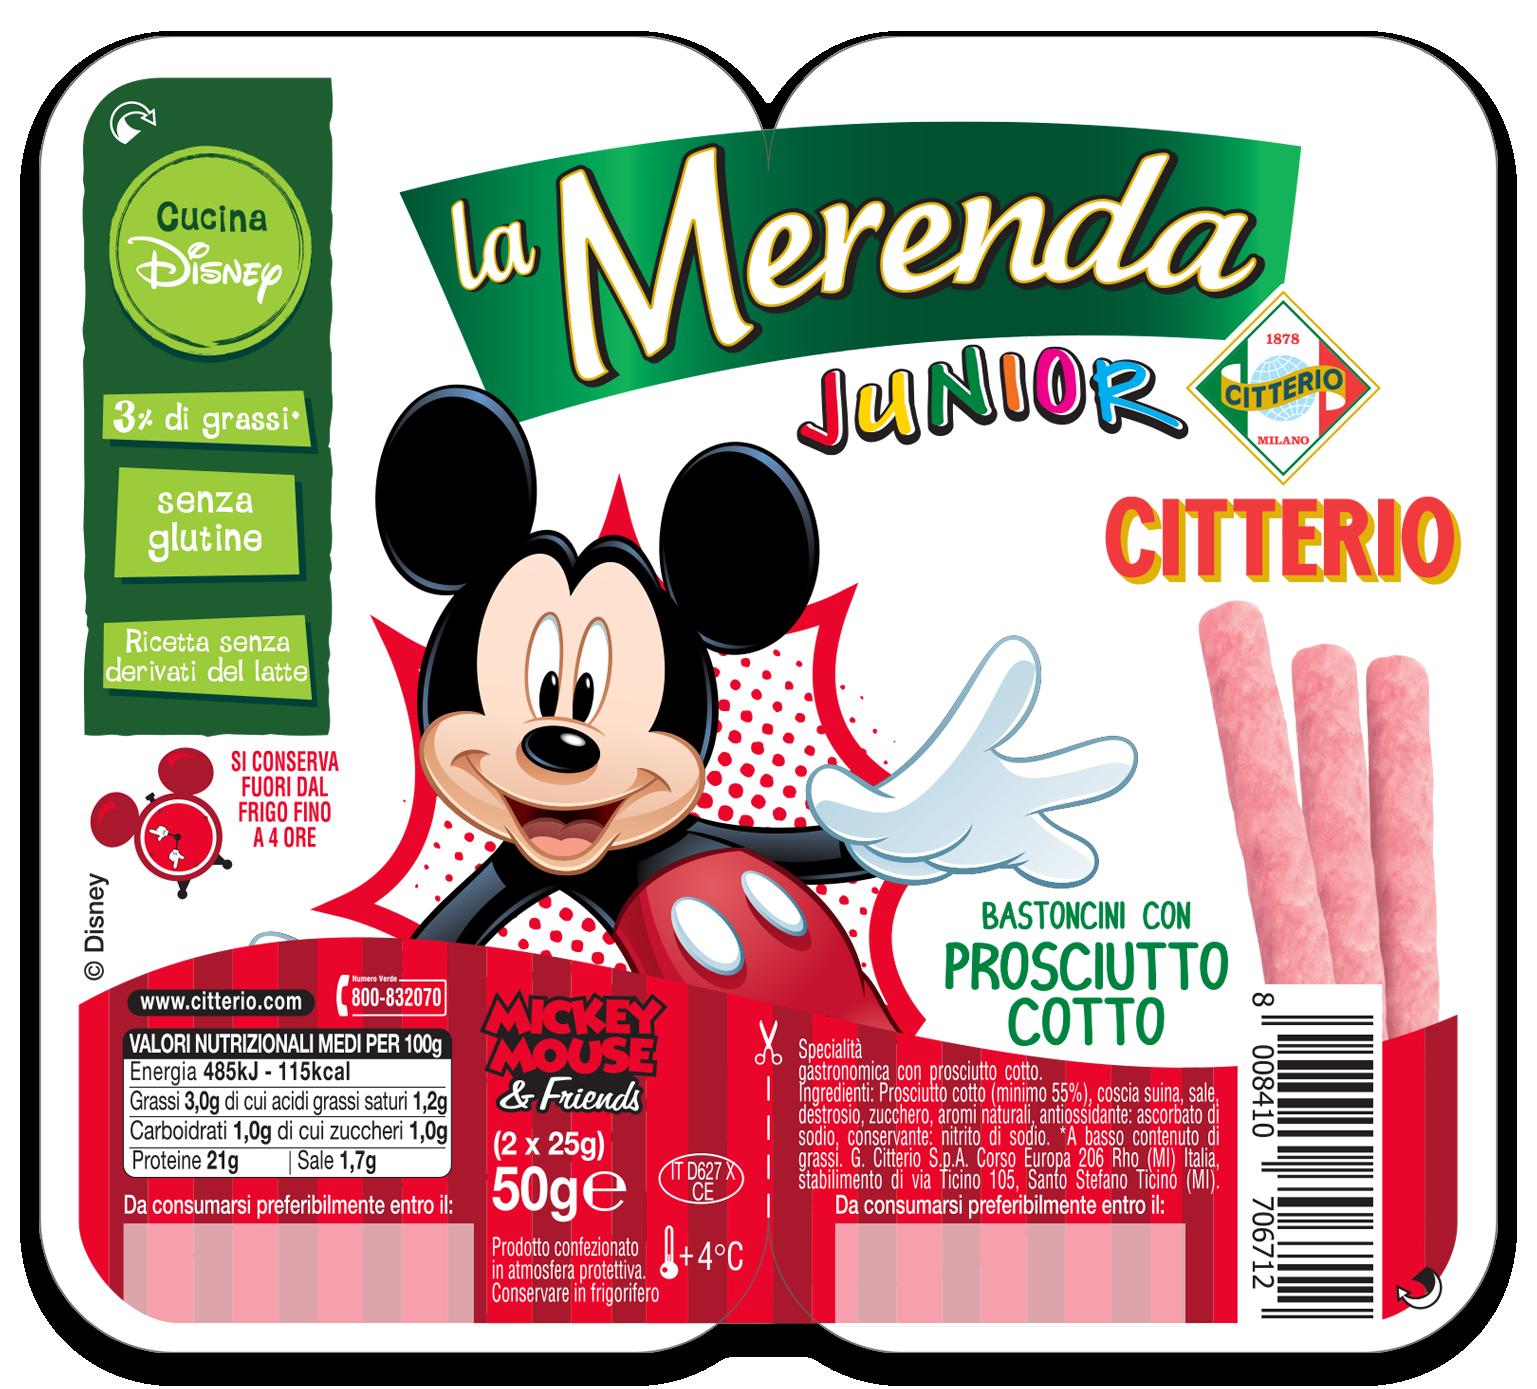 citterio-merenda-cotto.png